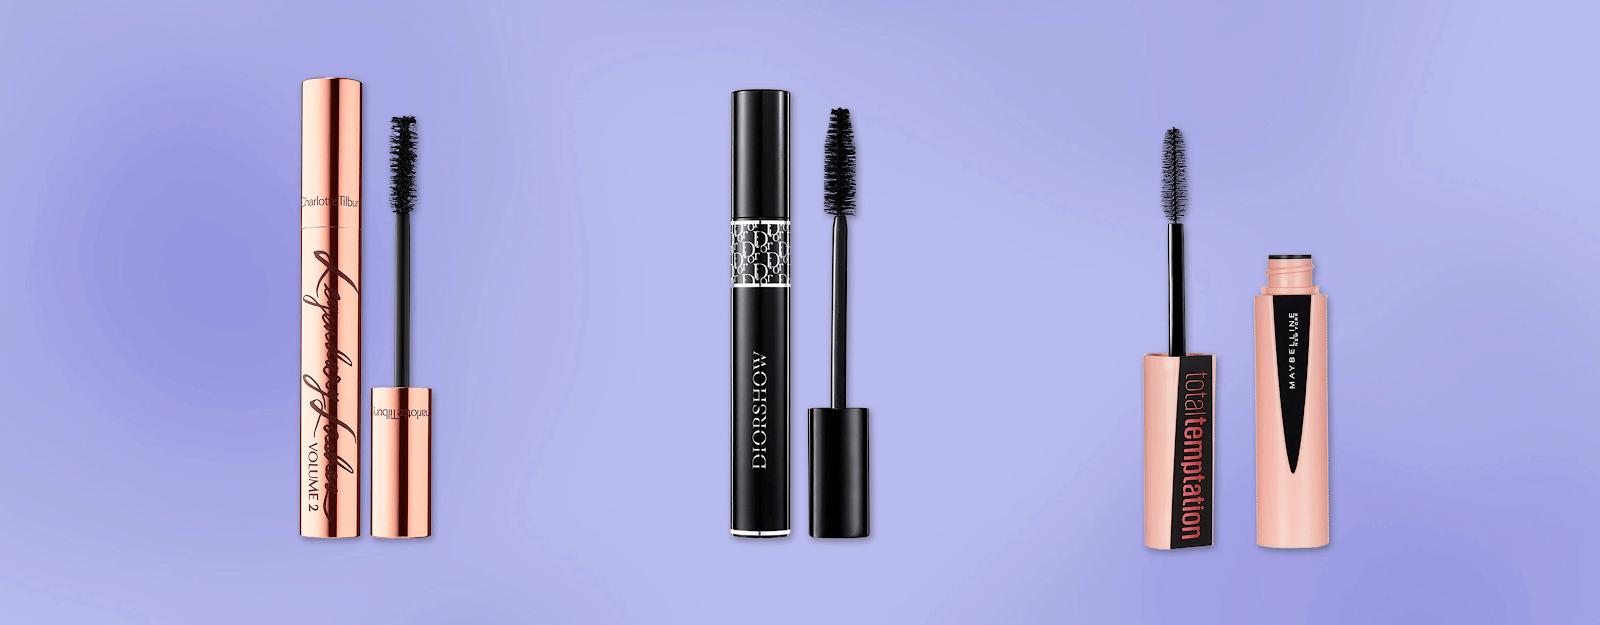 Always contains mascara-Eye Makeup tips